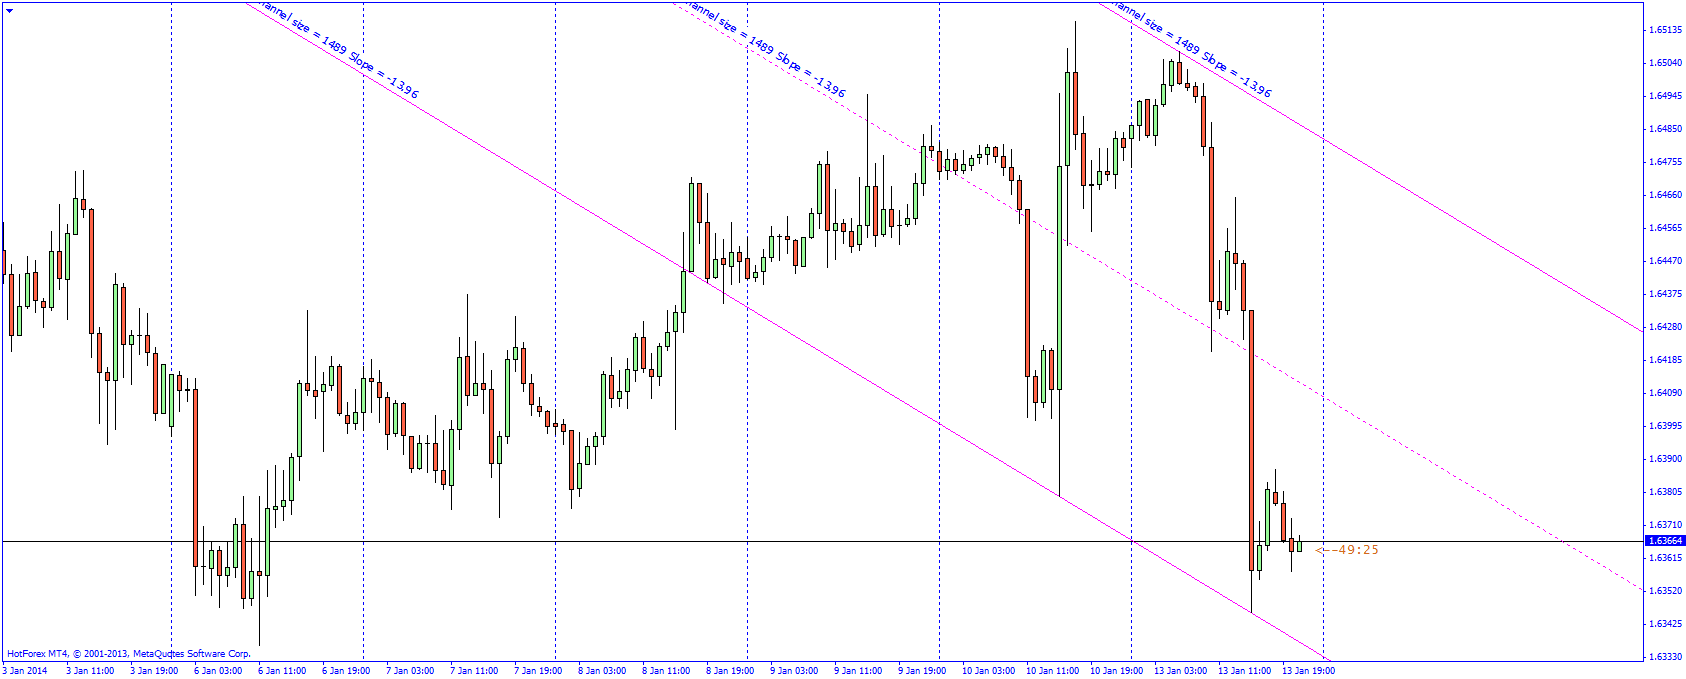 Live trading chart für binäre optionen foto 8